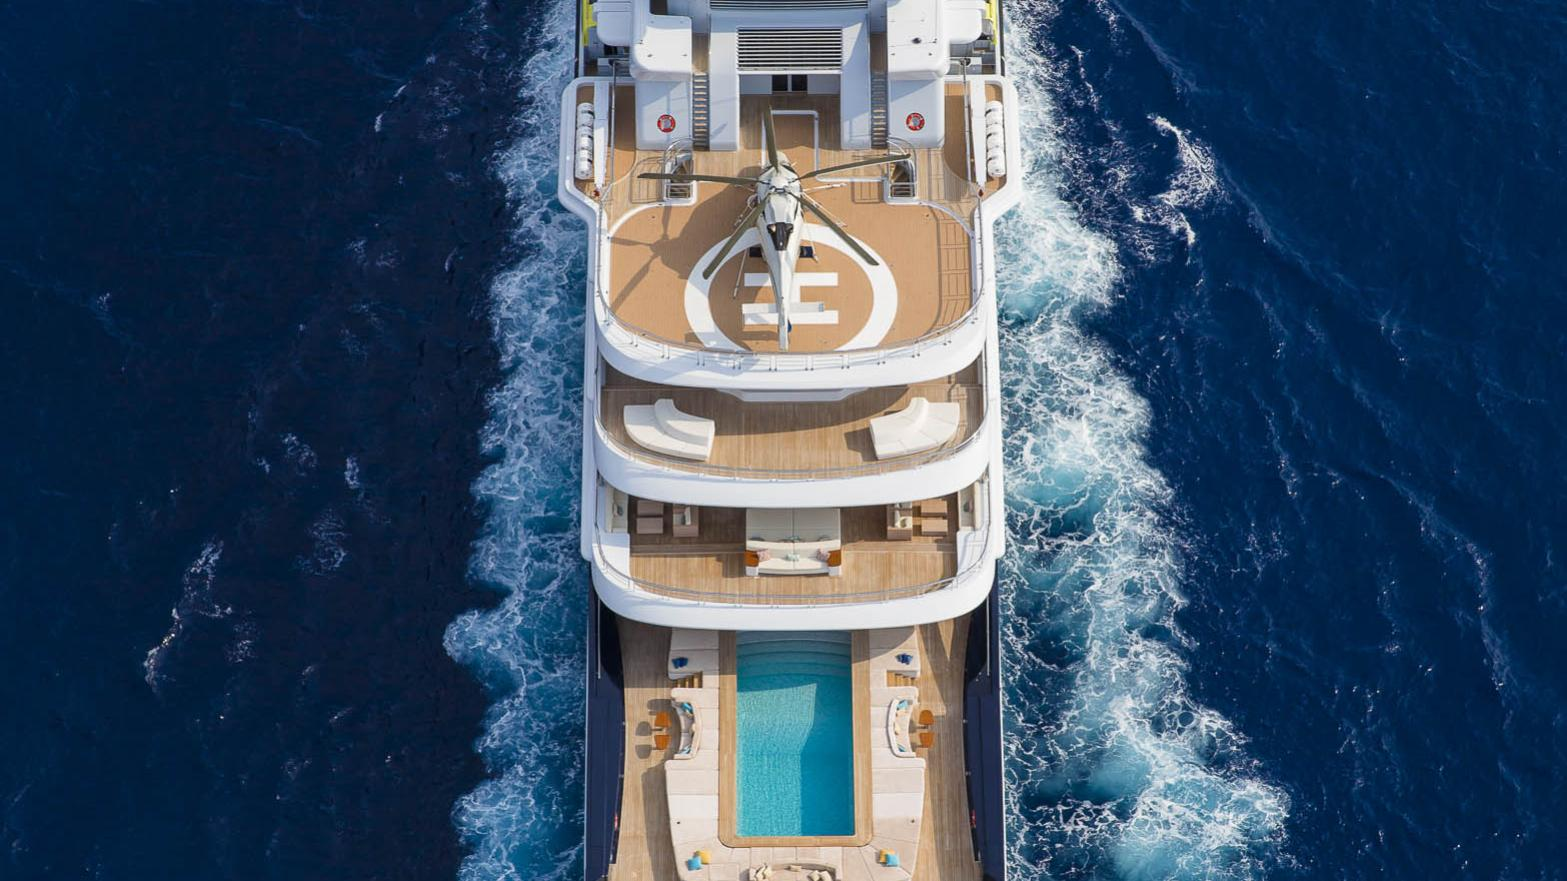 luna superyacht lloyd werft 2010 115m aerial